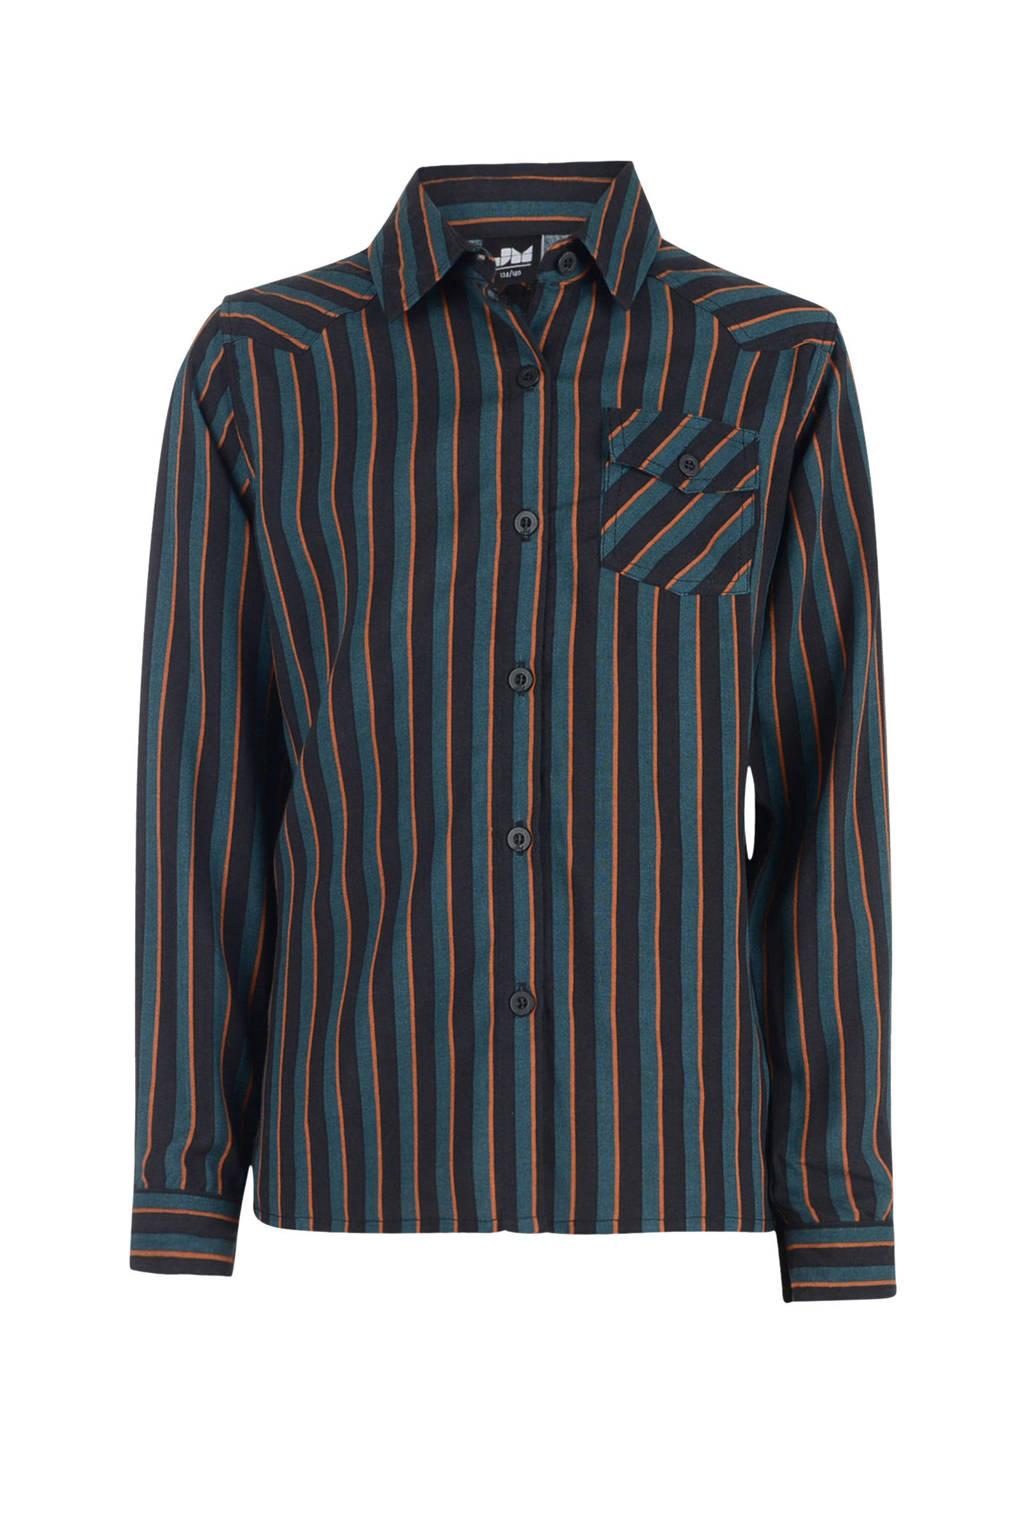 Jill gestreepte blouse Miona donkerblauw/roestbruin/zwart, Donkerblauw/roestbruin/zwart